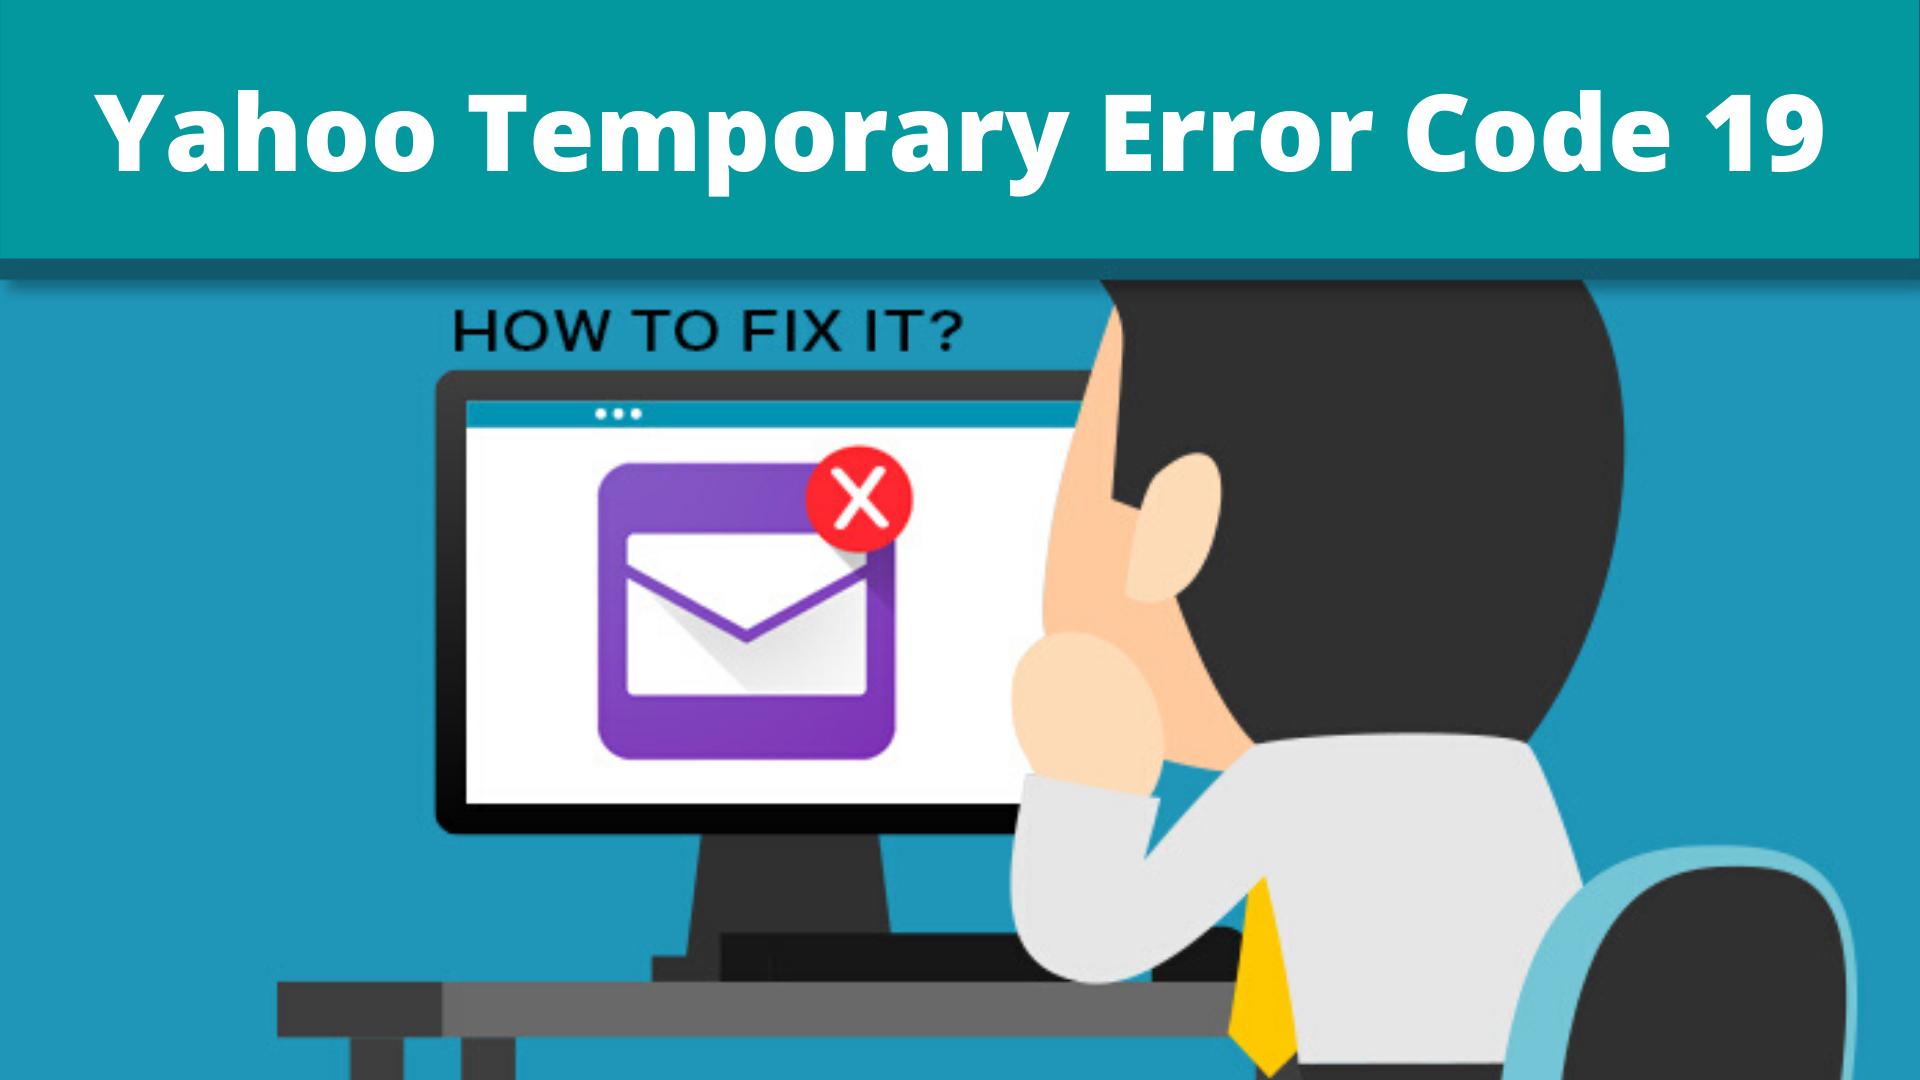 Yahoo Temporary Error Code 19: How To Resolve It?